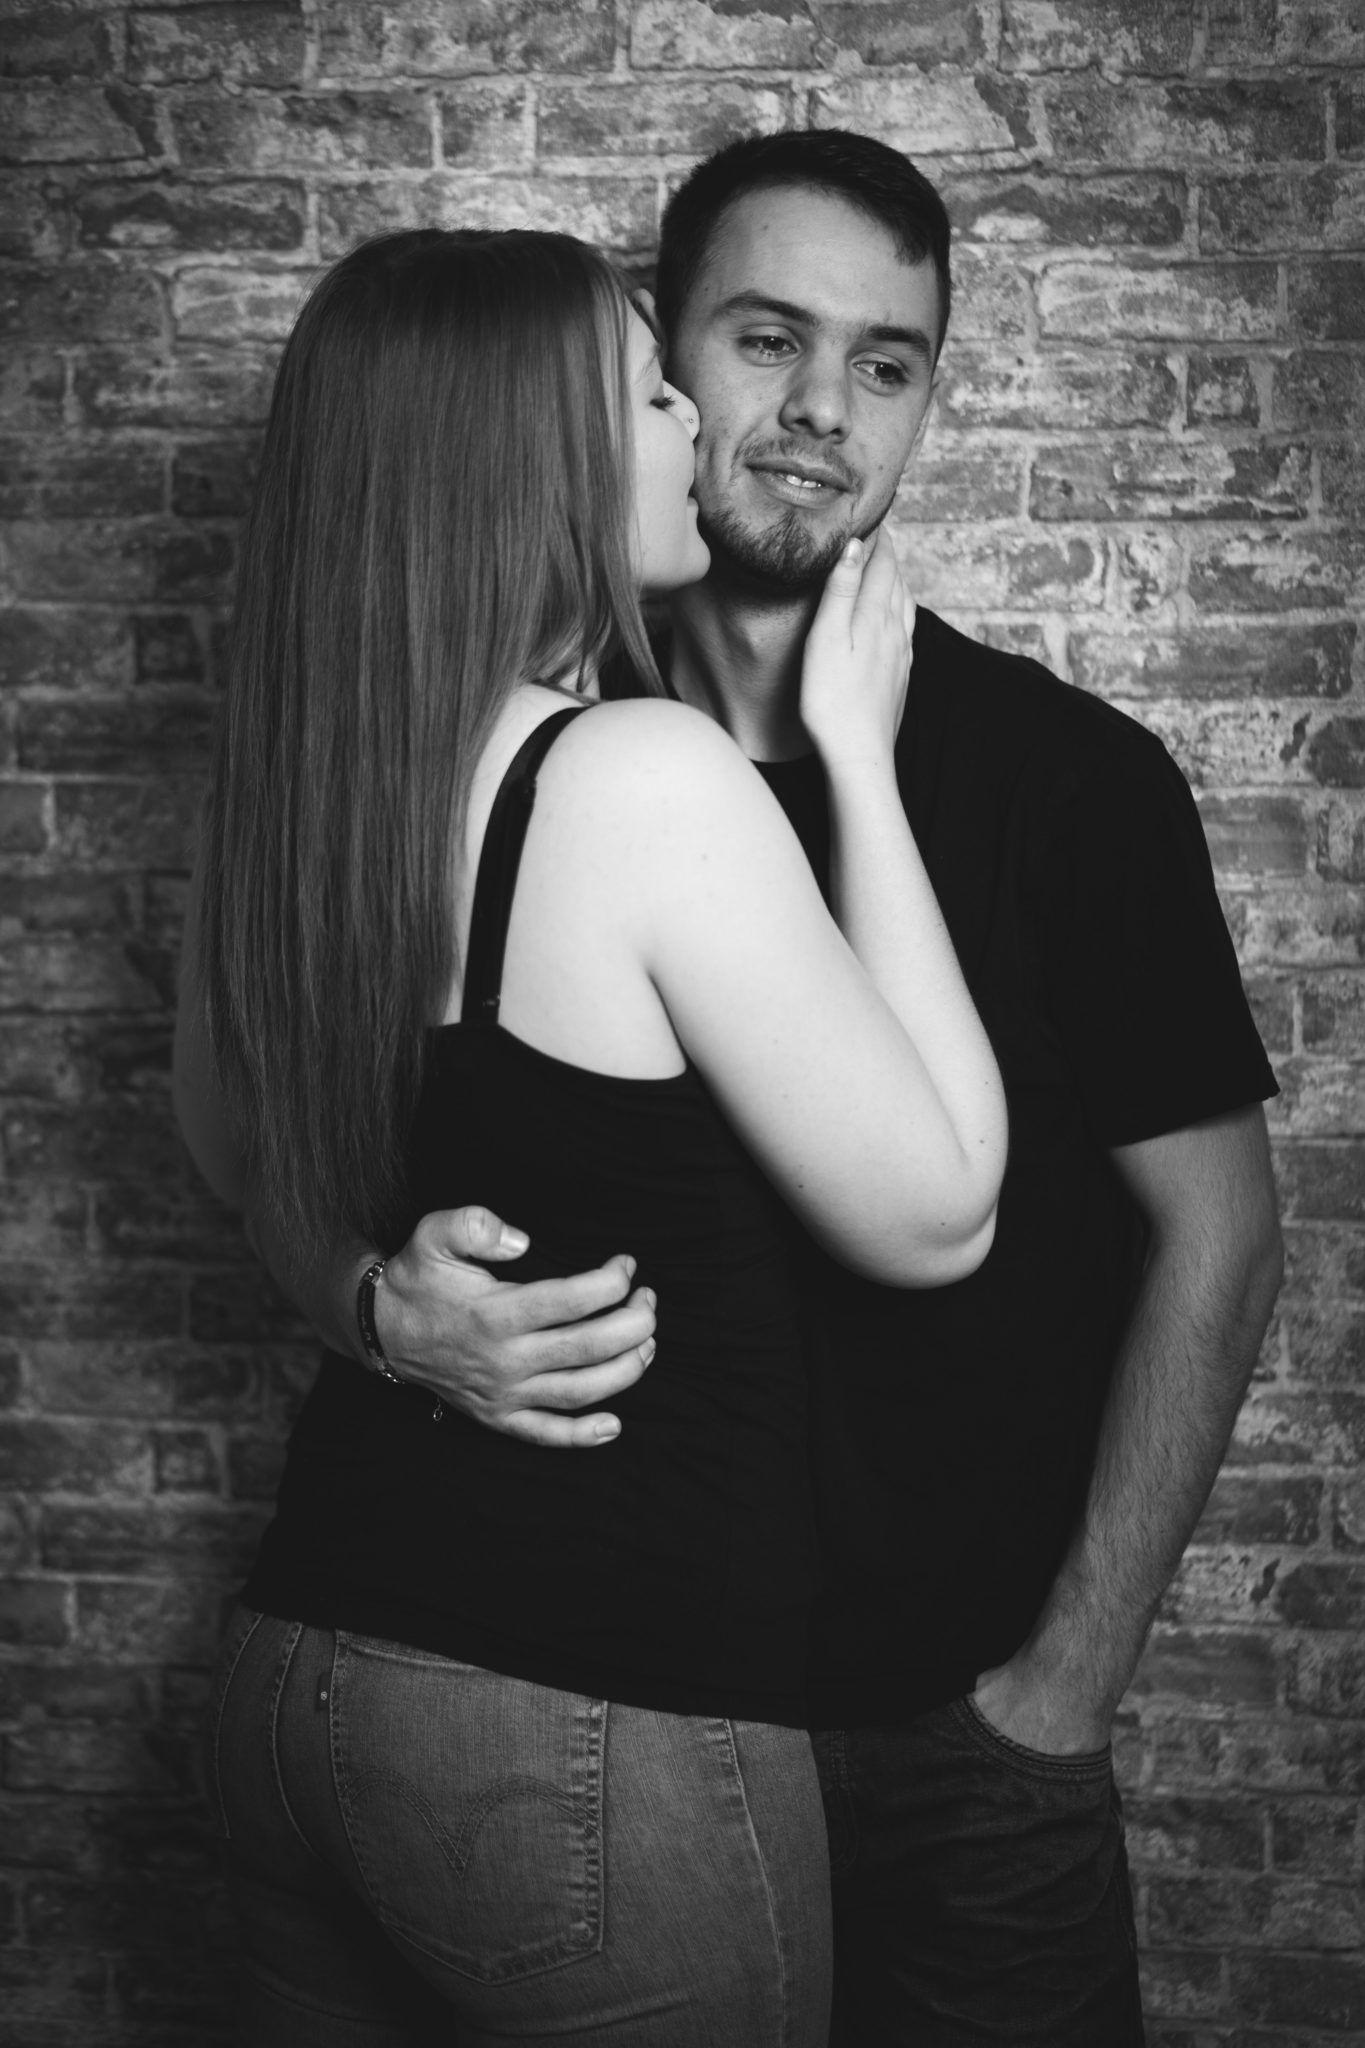 Paarshooting Leipzig Fotograf - lässige Pose mit Kuss auf die Wange